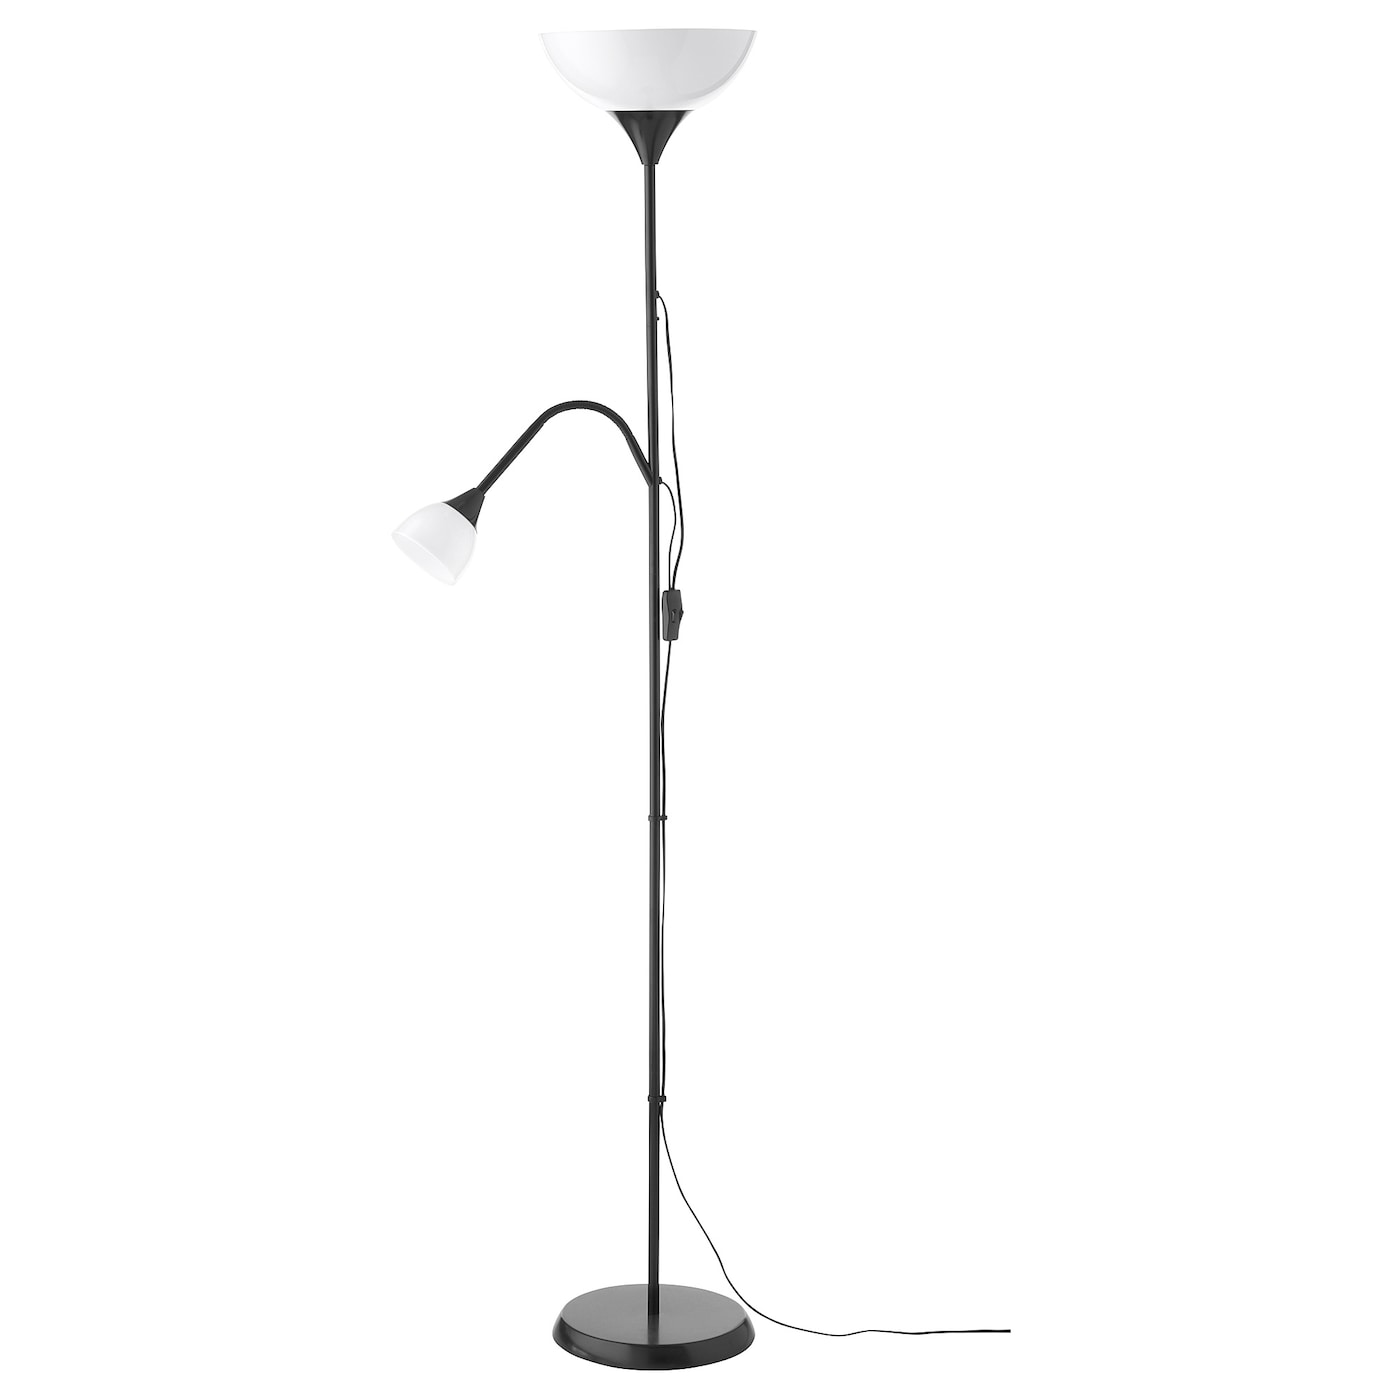 Stehlampe Beleuchtung Ikea Ranarp Standleuchte Leseleuchte In